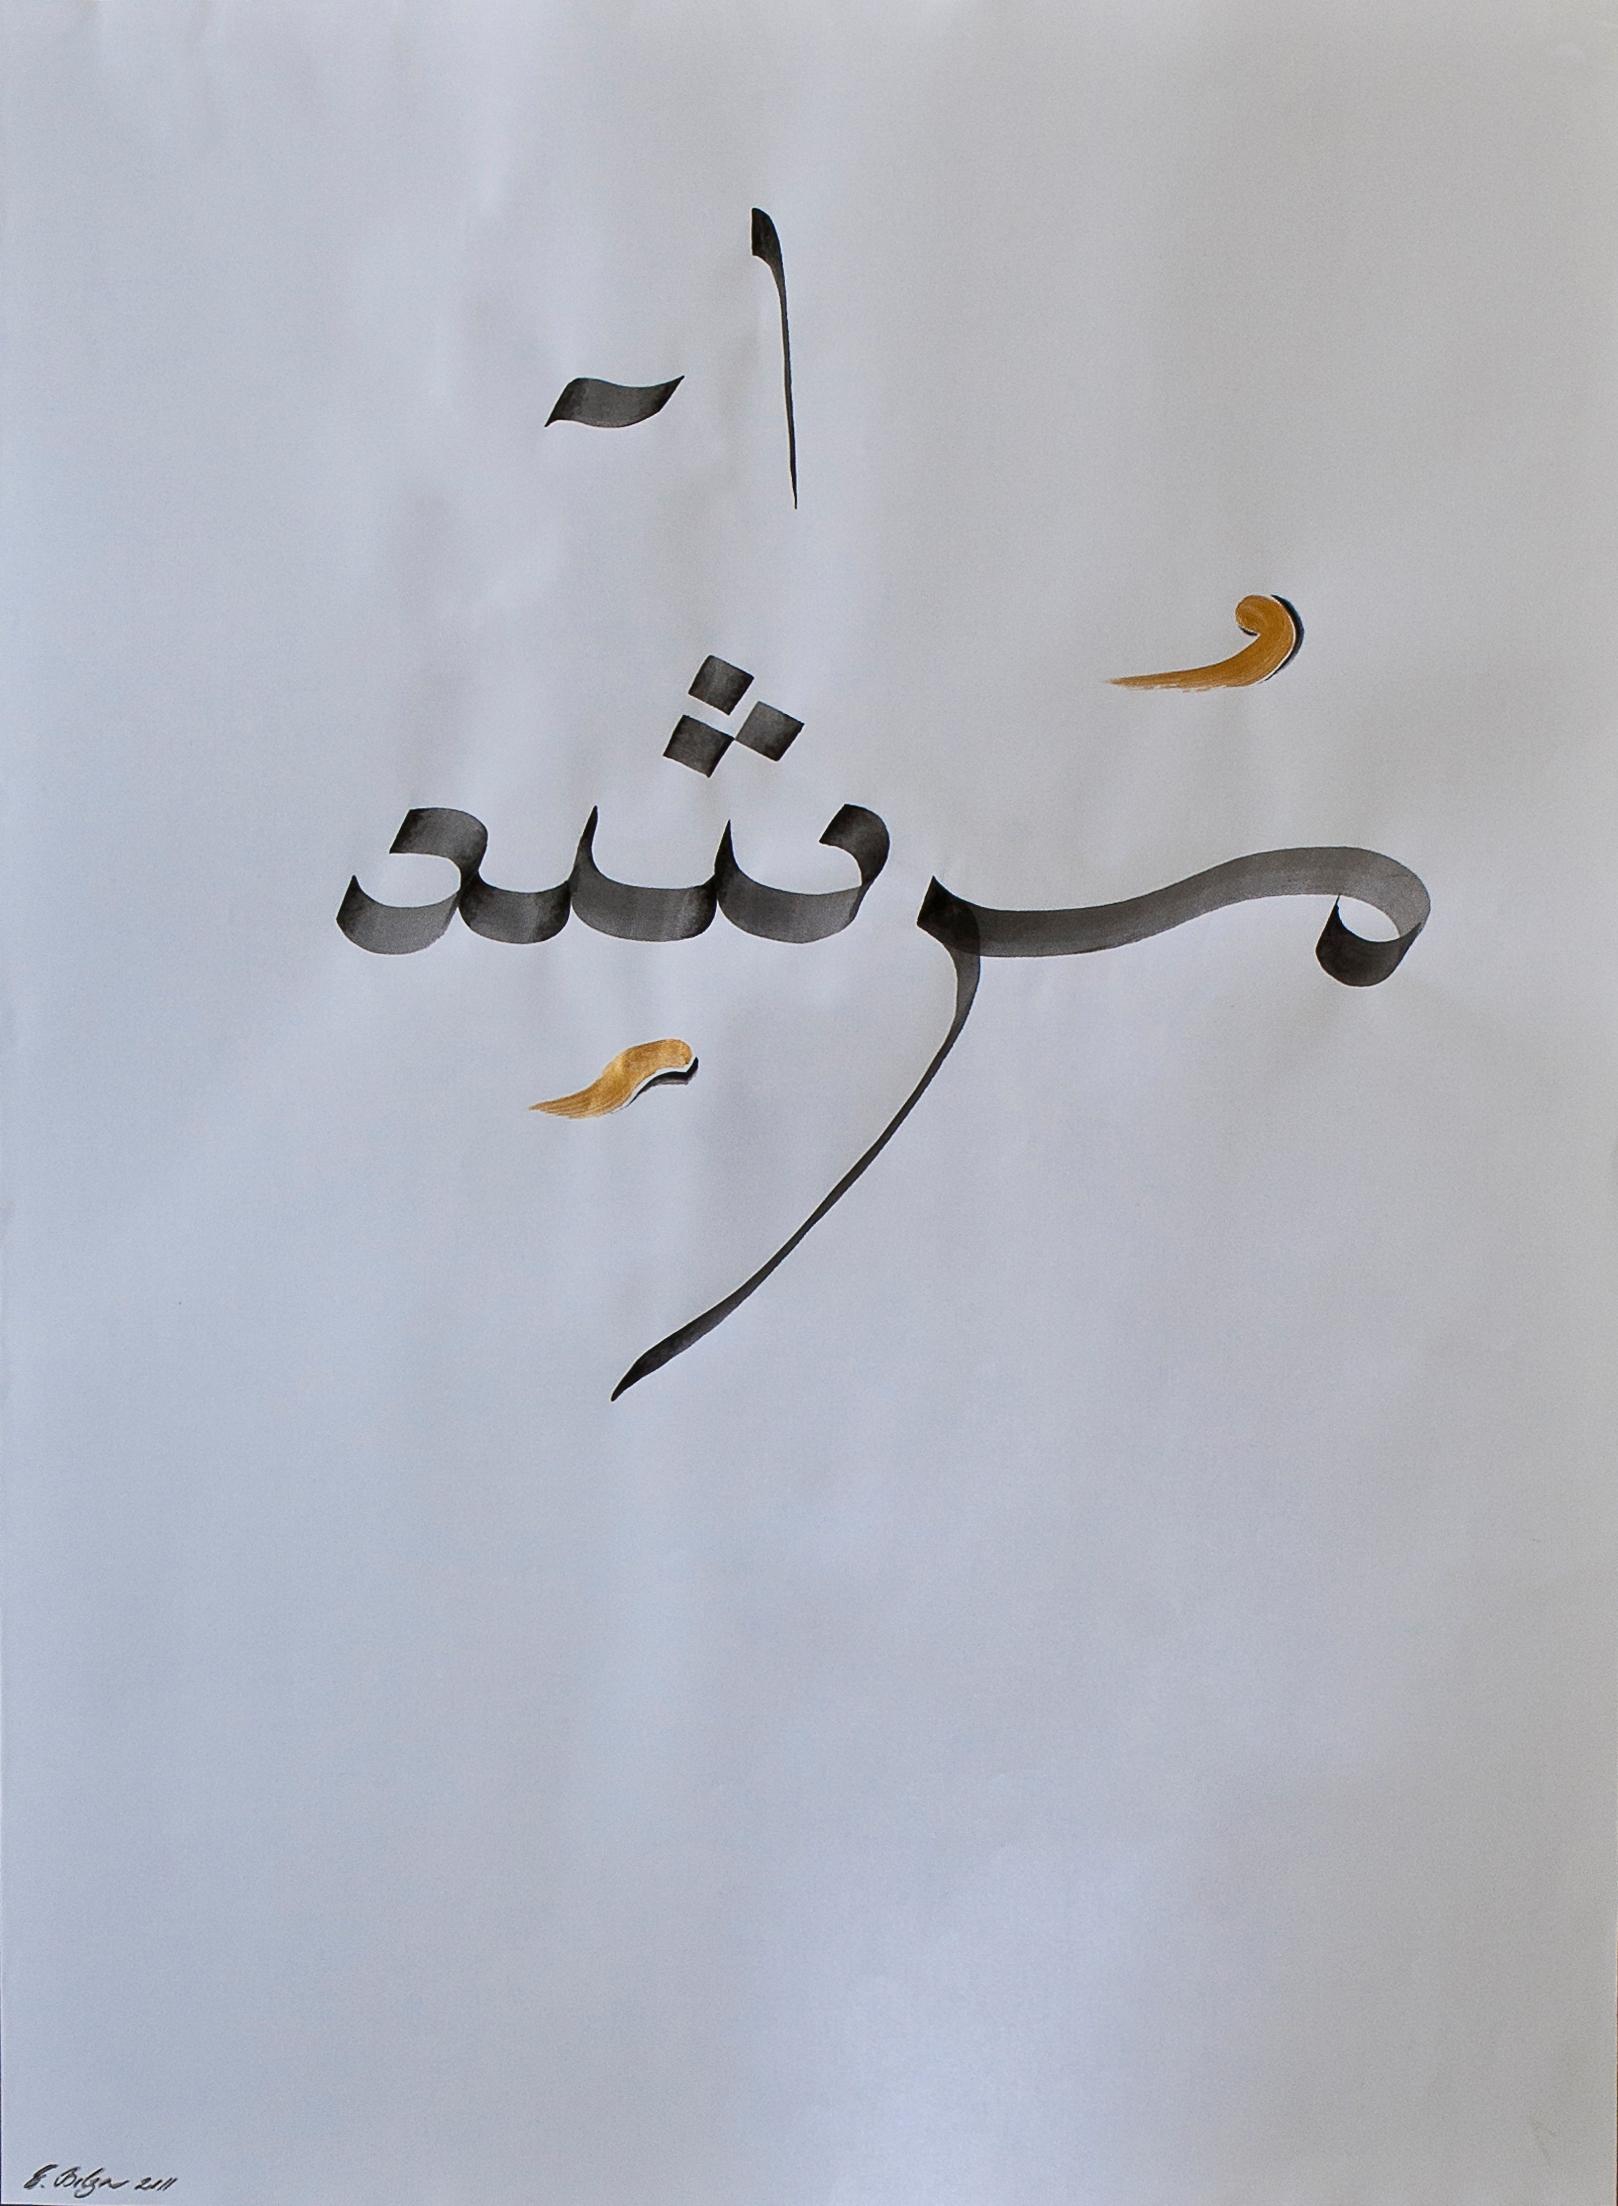 Calligraphic Installation Sheet     92 x 100 cm